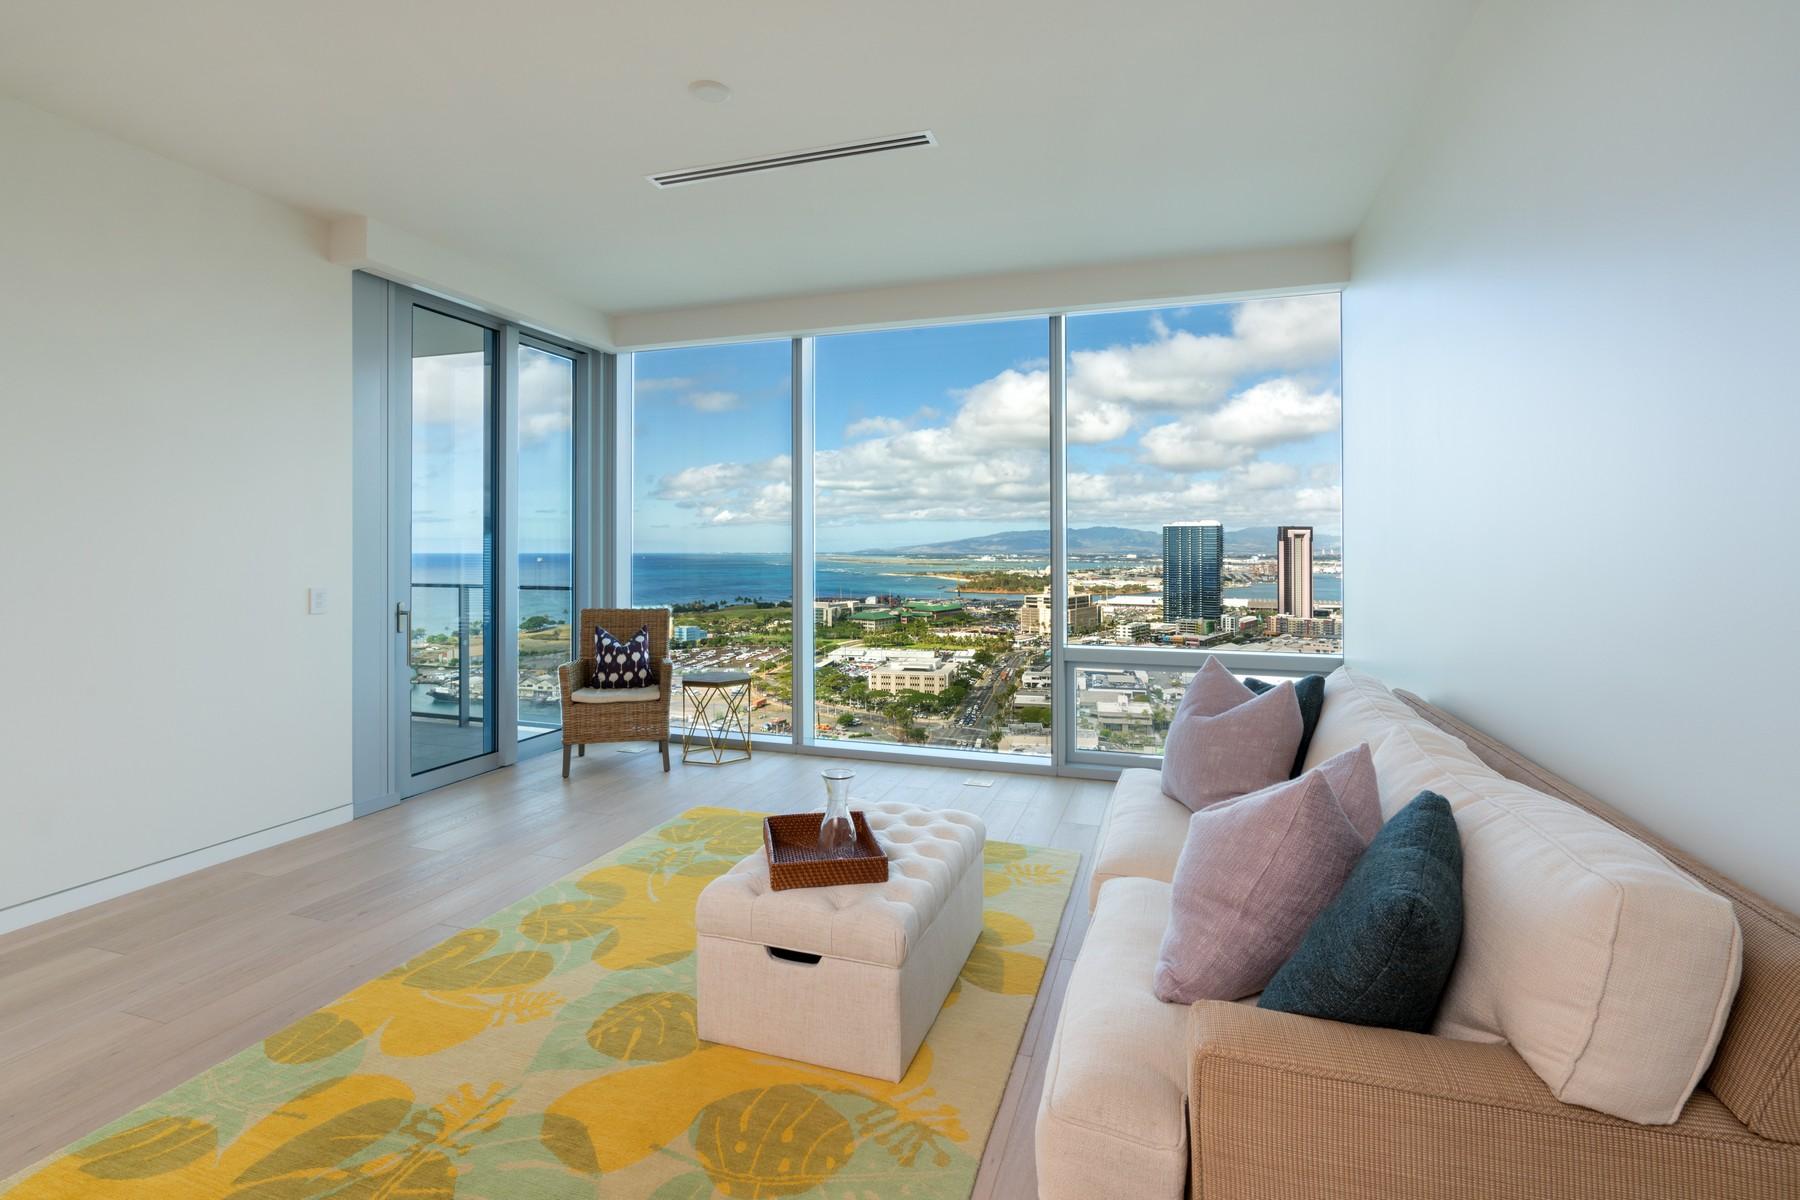 Condominium for Sale at Panoramic Ocean View Waiea Condo 1118 Ala Moana Blvd #2903 Honolulu, Hawaii 96814 United States